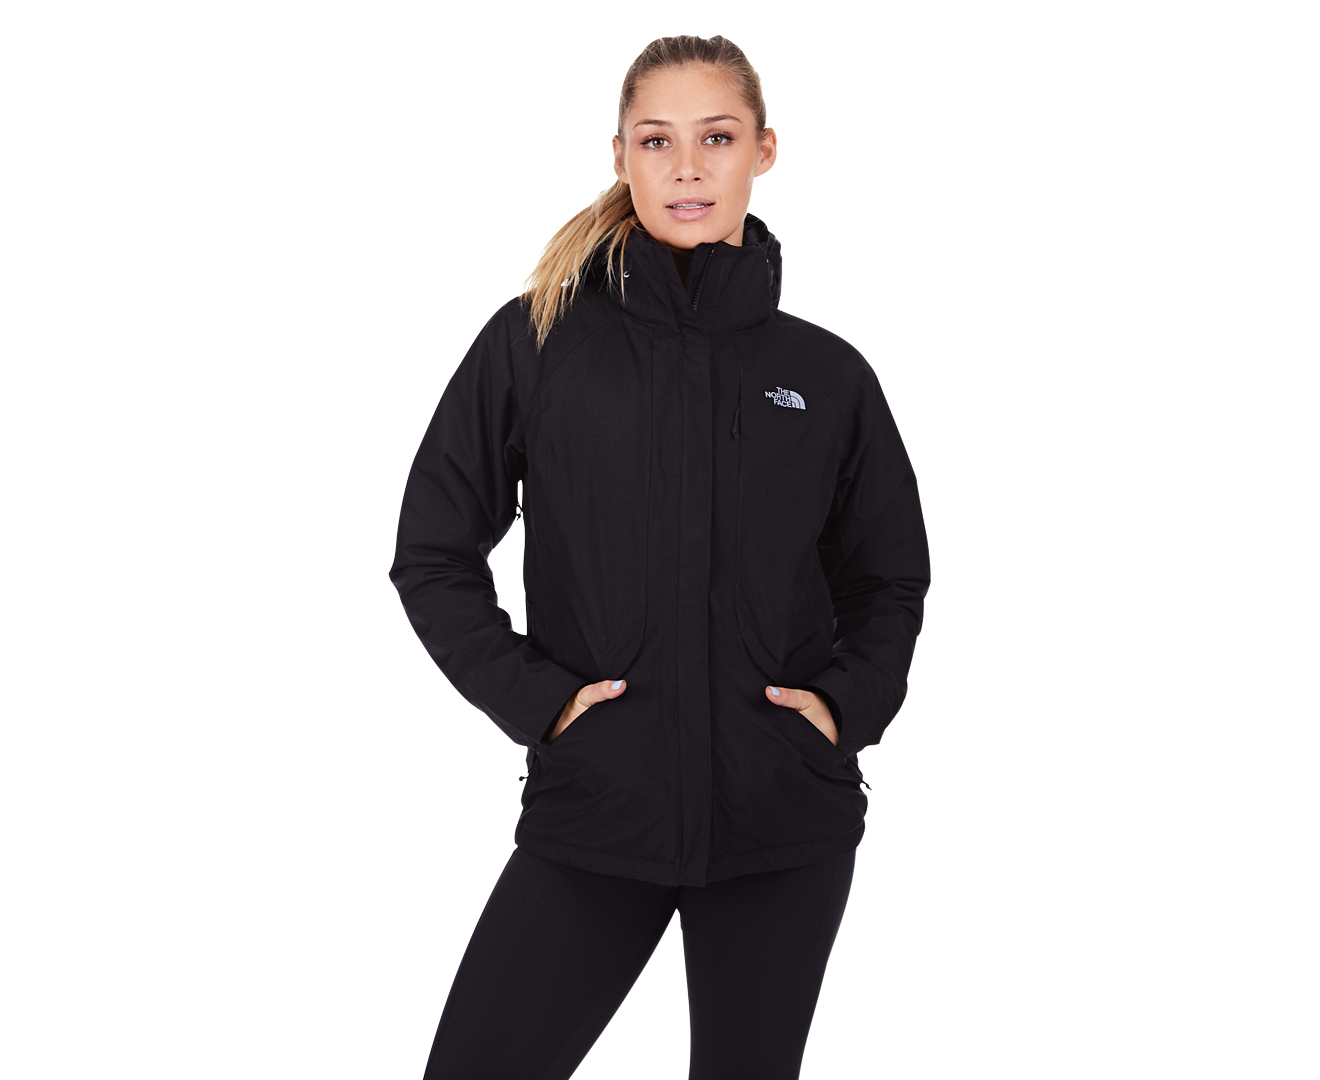 0c79e2715 The North Face Women's Inlux Insulated Jacket - TNF Black | Catch.com.au